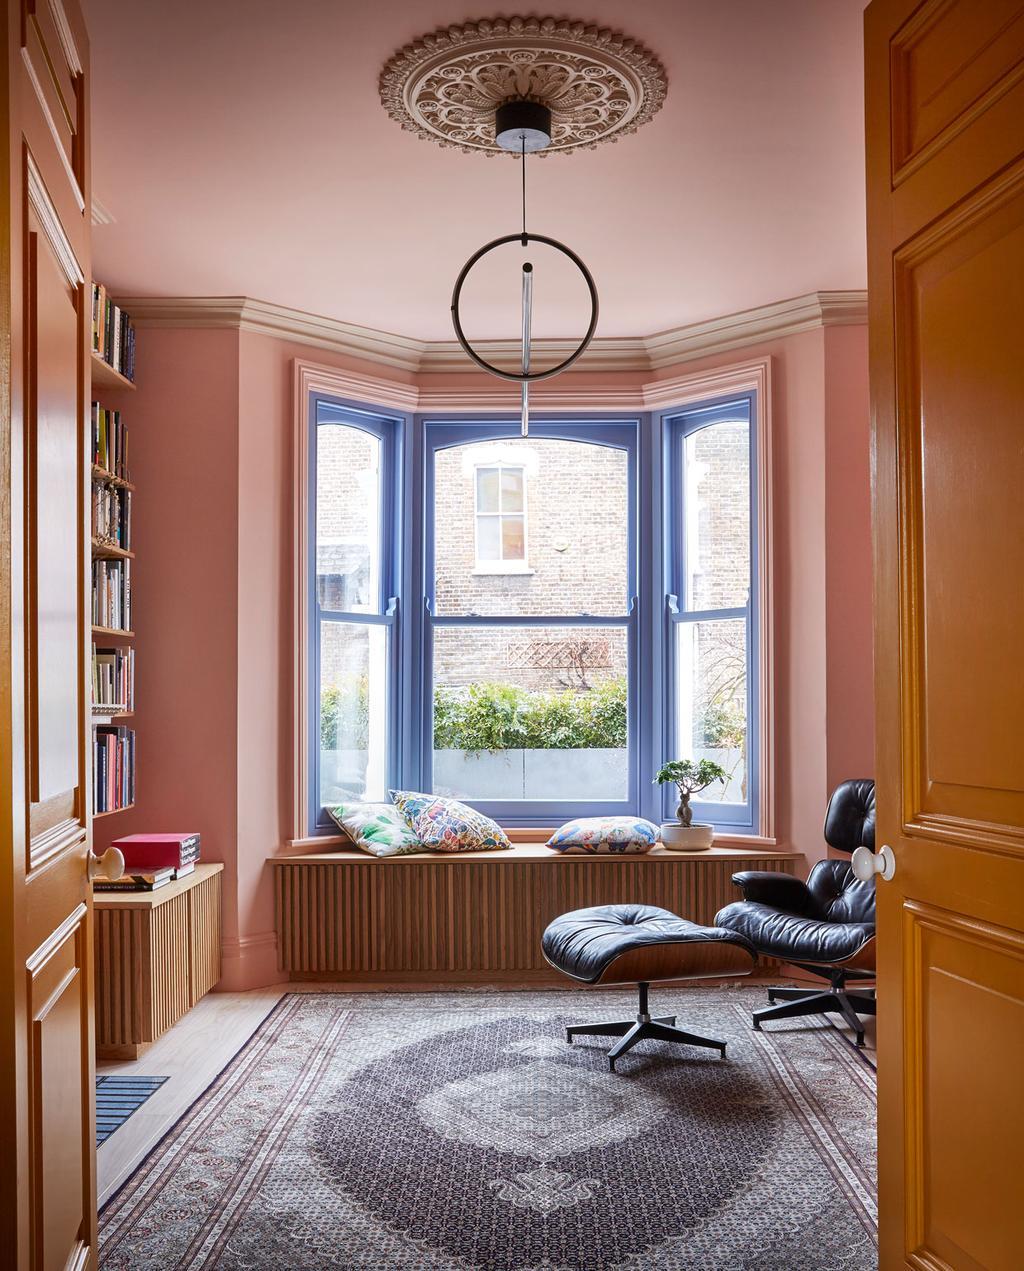 vtwonen 05-2020 | styling colourboost woonkamer met roze muren en paarse kozijnen en zwarte eames fauteuil